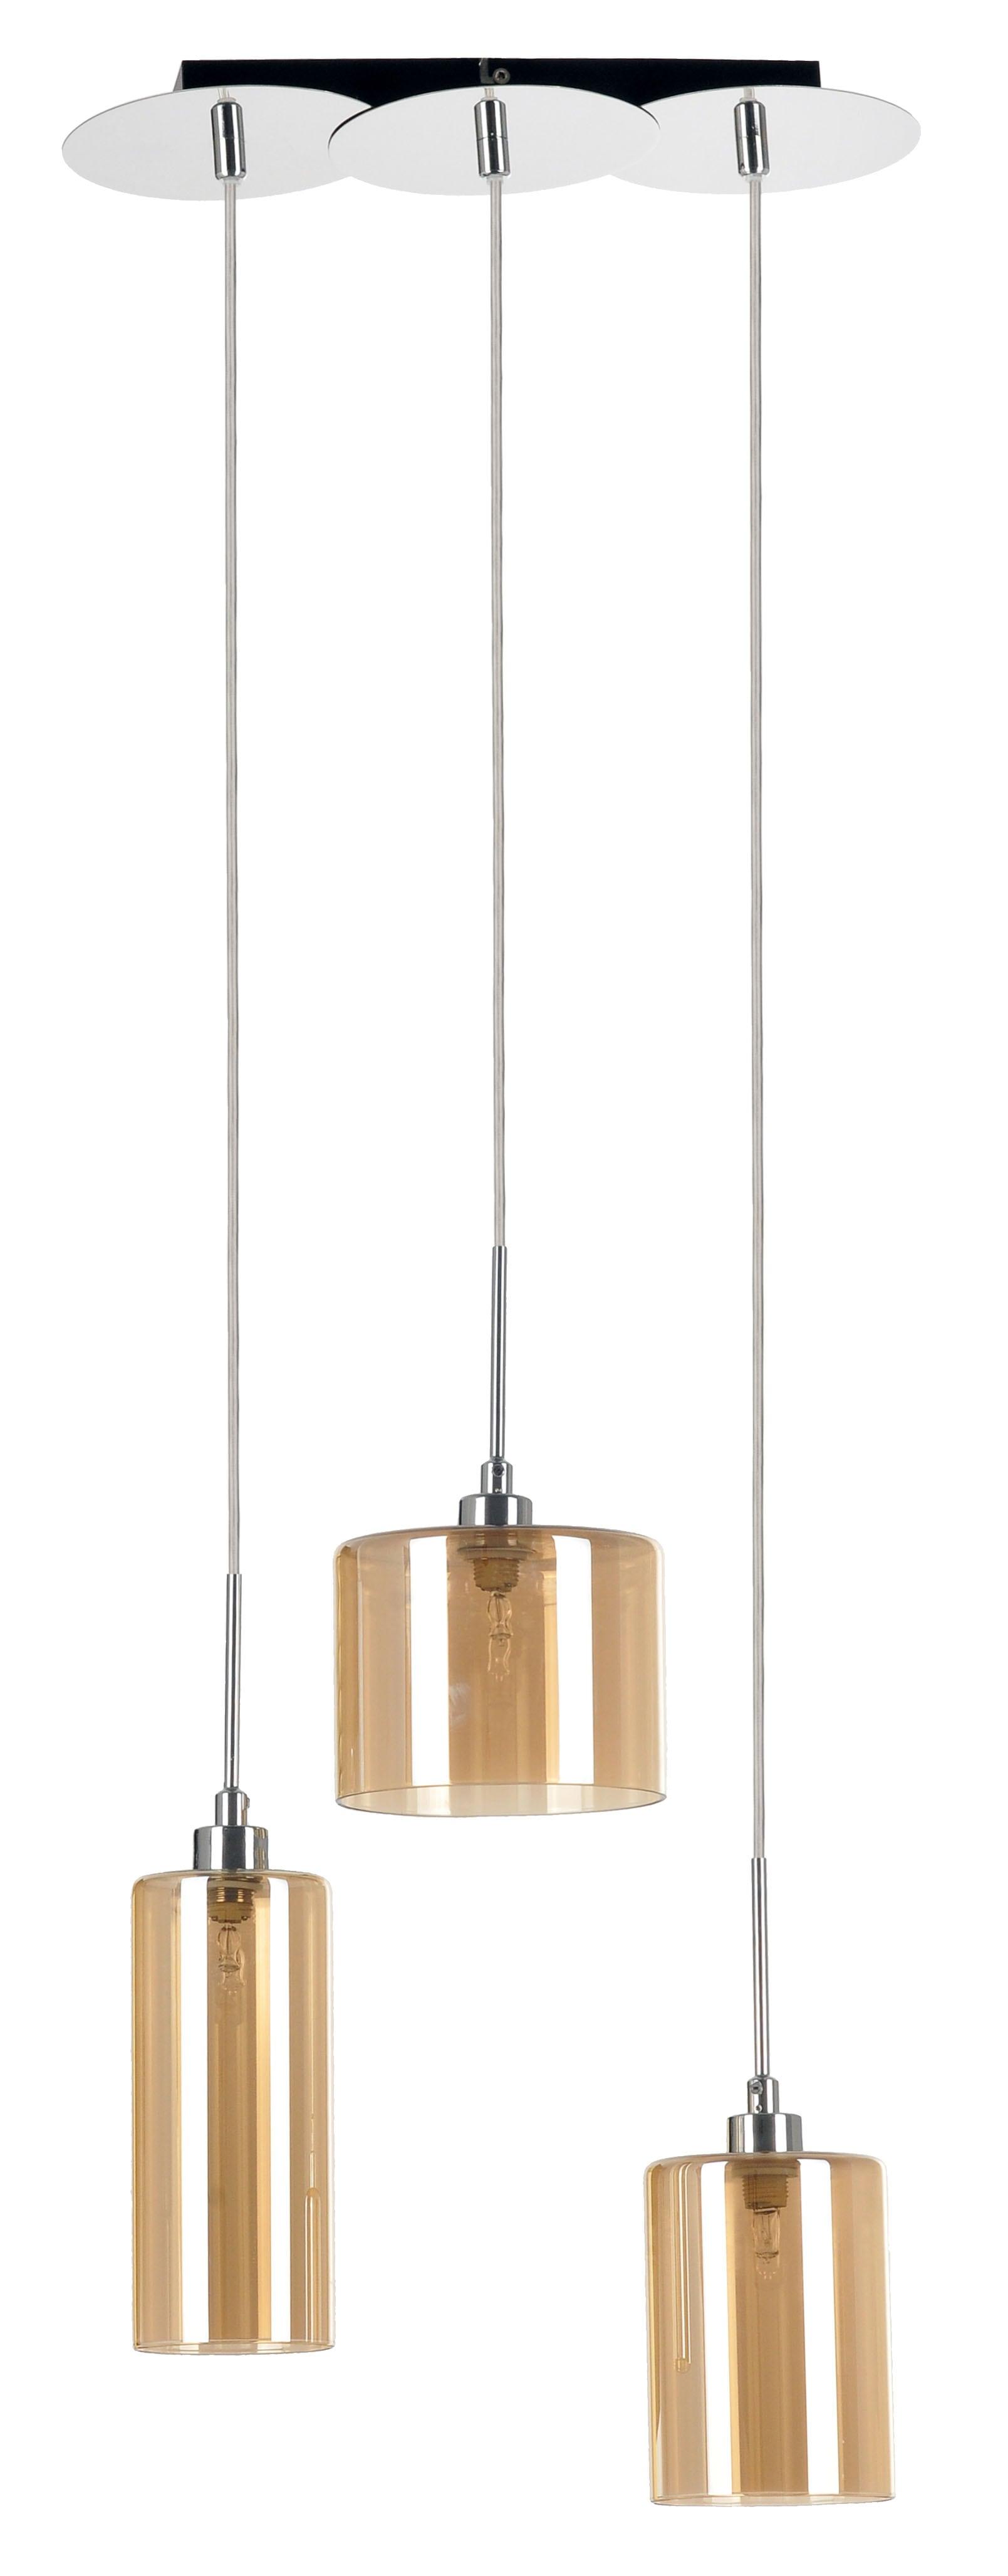 Lampa suspendată Eurybia tripla crom / șampanie G9 28W